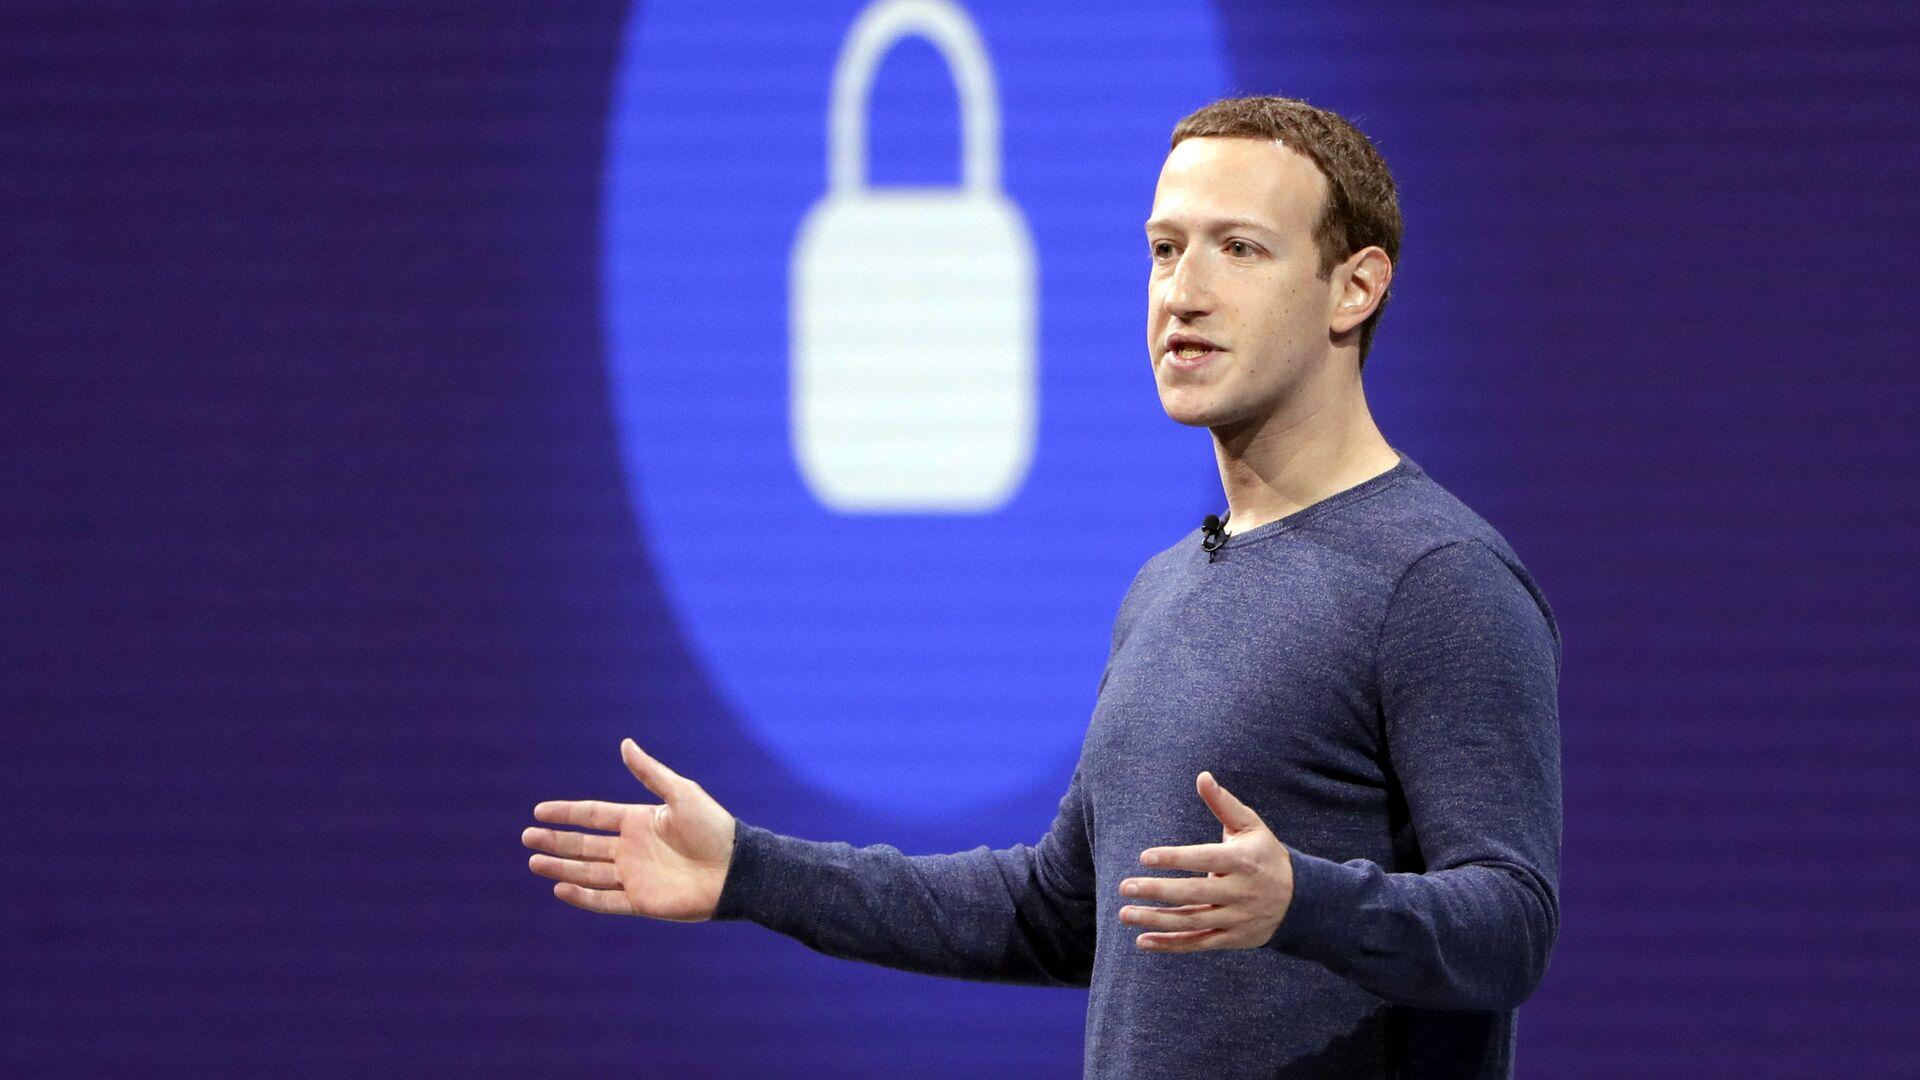 Mark Zuckerberg, fundador de Facebook (archivo) - Sputnik Mundo, 1920, 08.04.2021